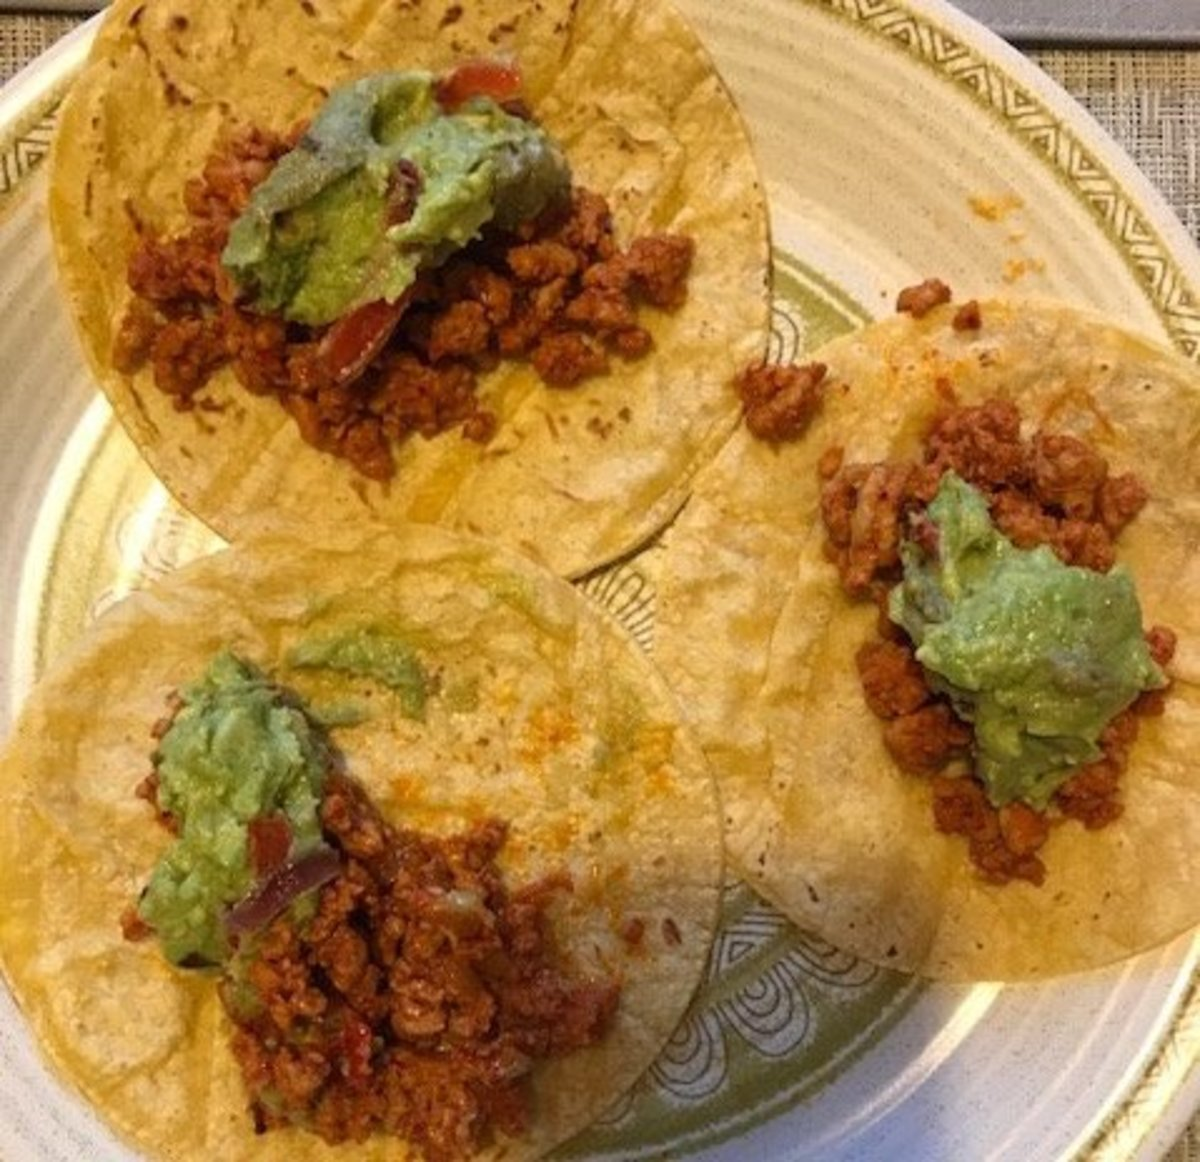 Authentic Guacamole Recipe from Mexico